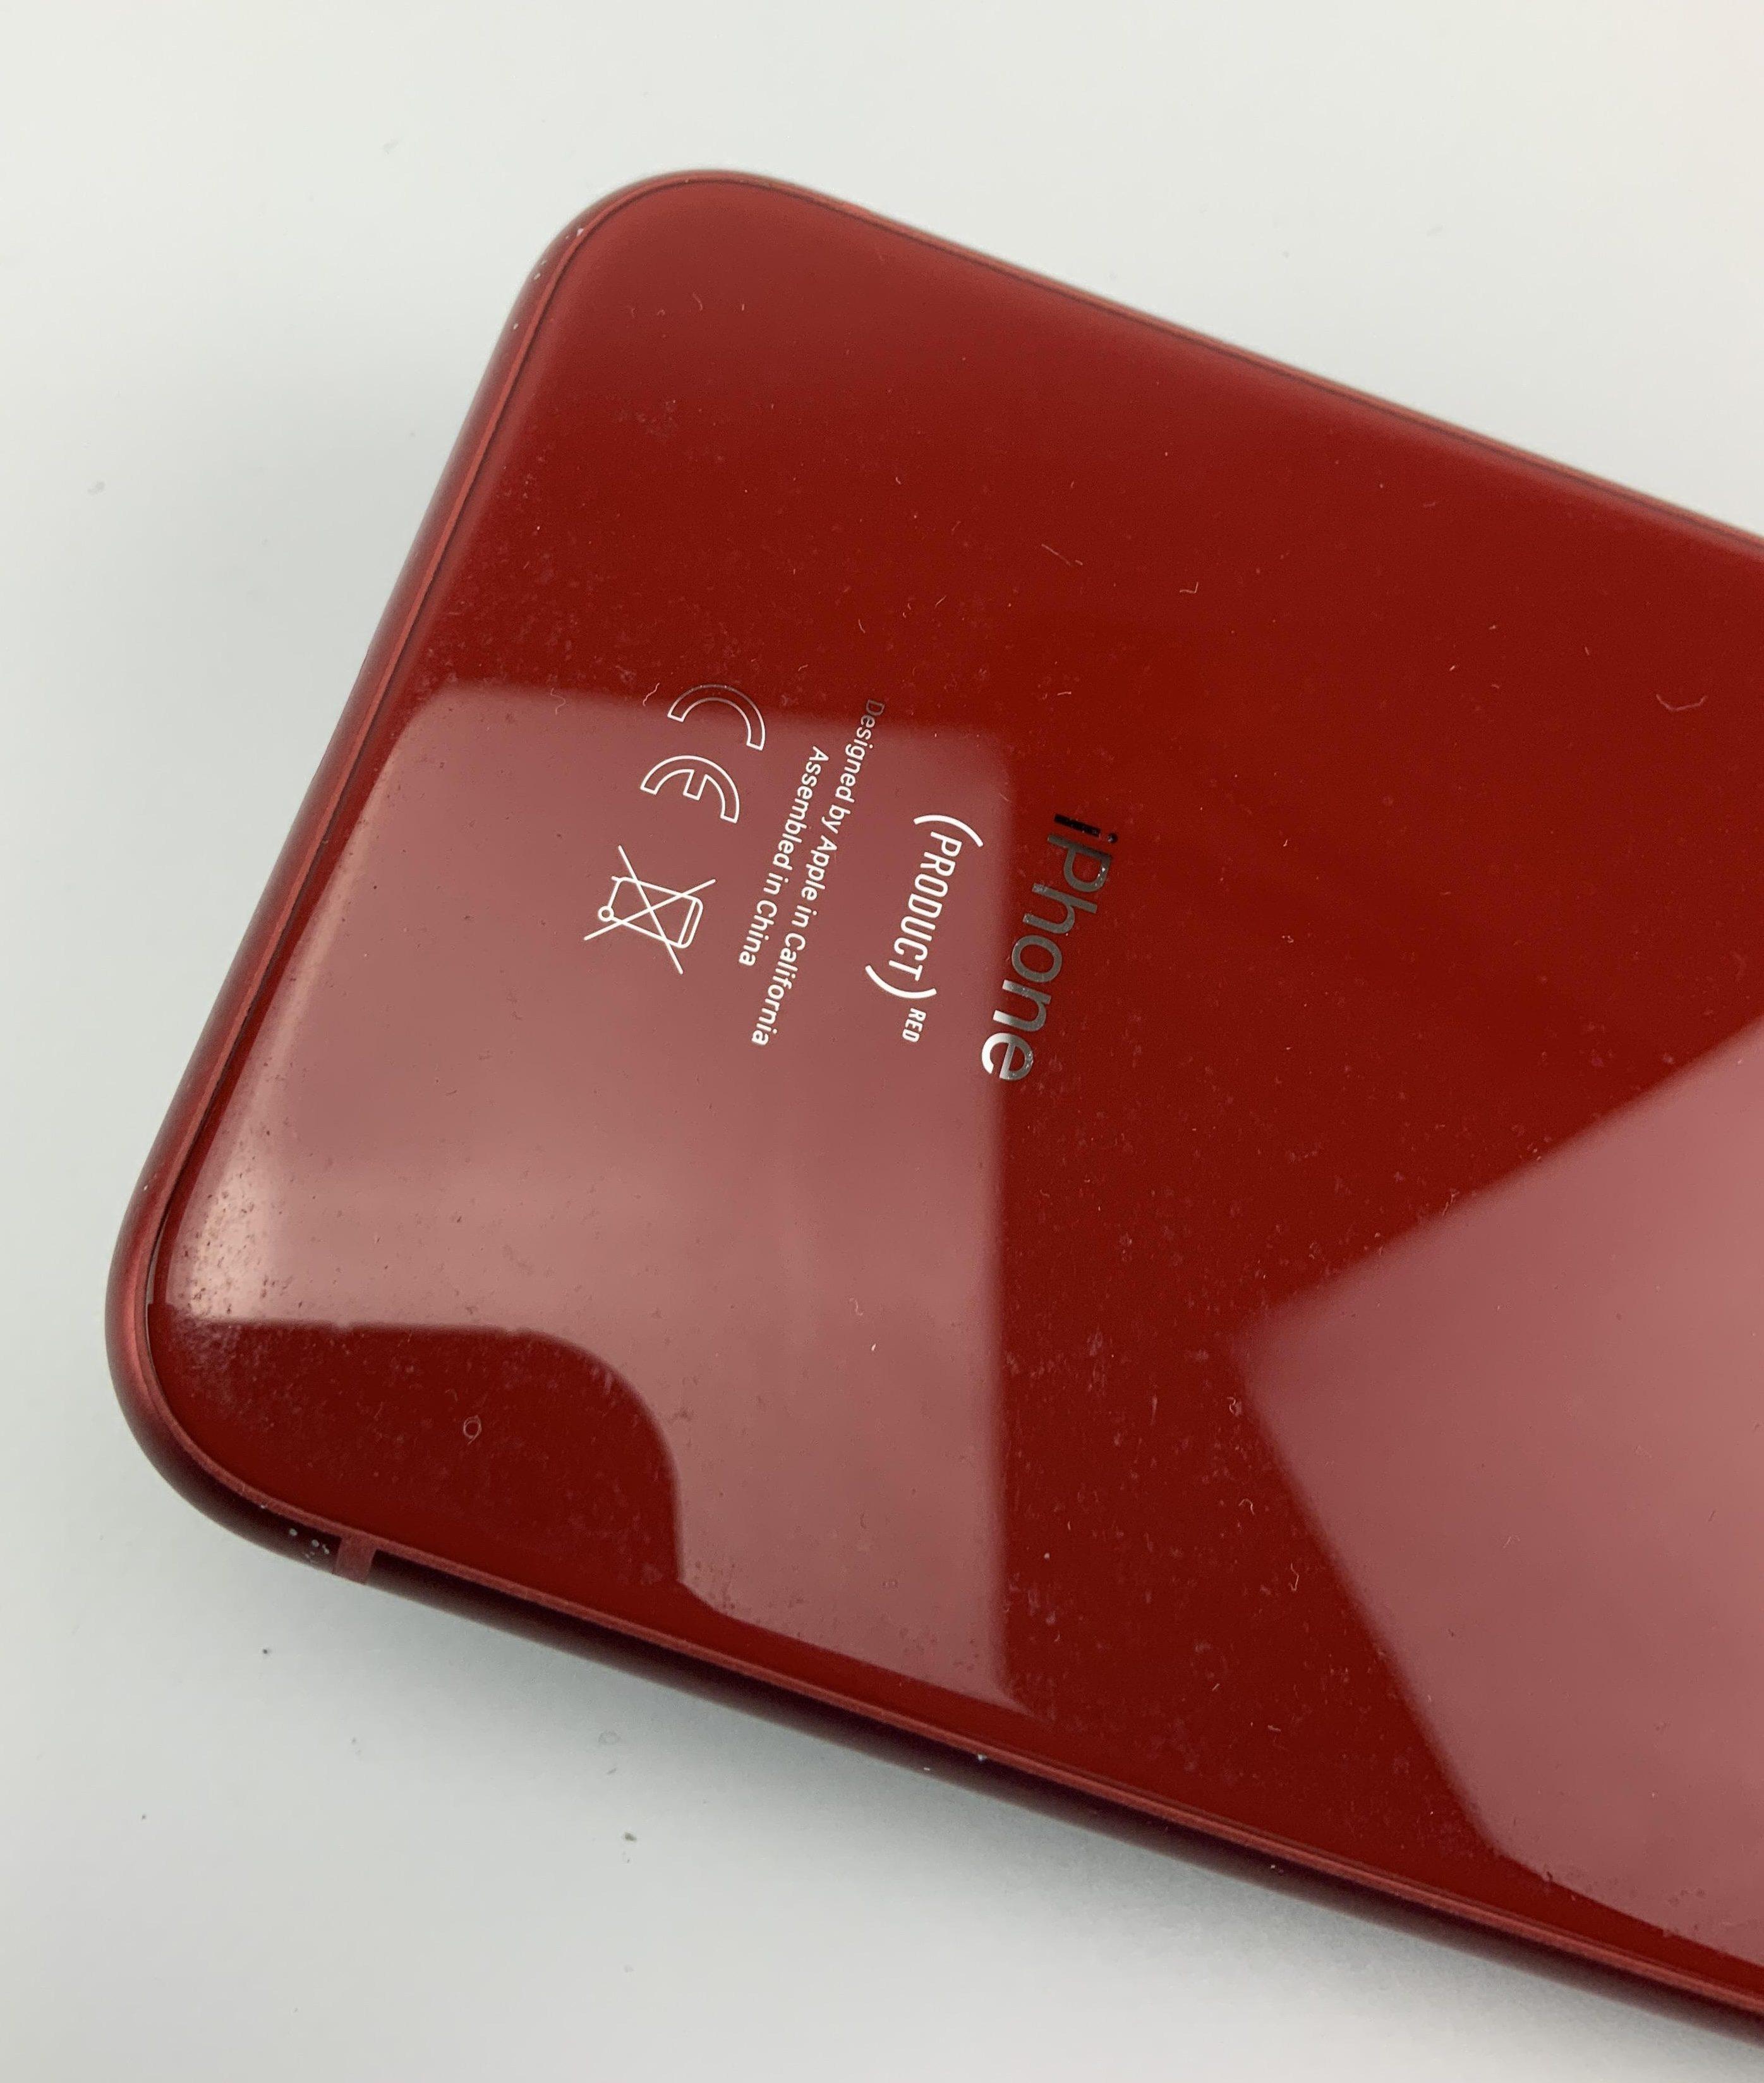 iPhone XR 64GB, 64GB, Red, Kuva 4